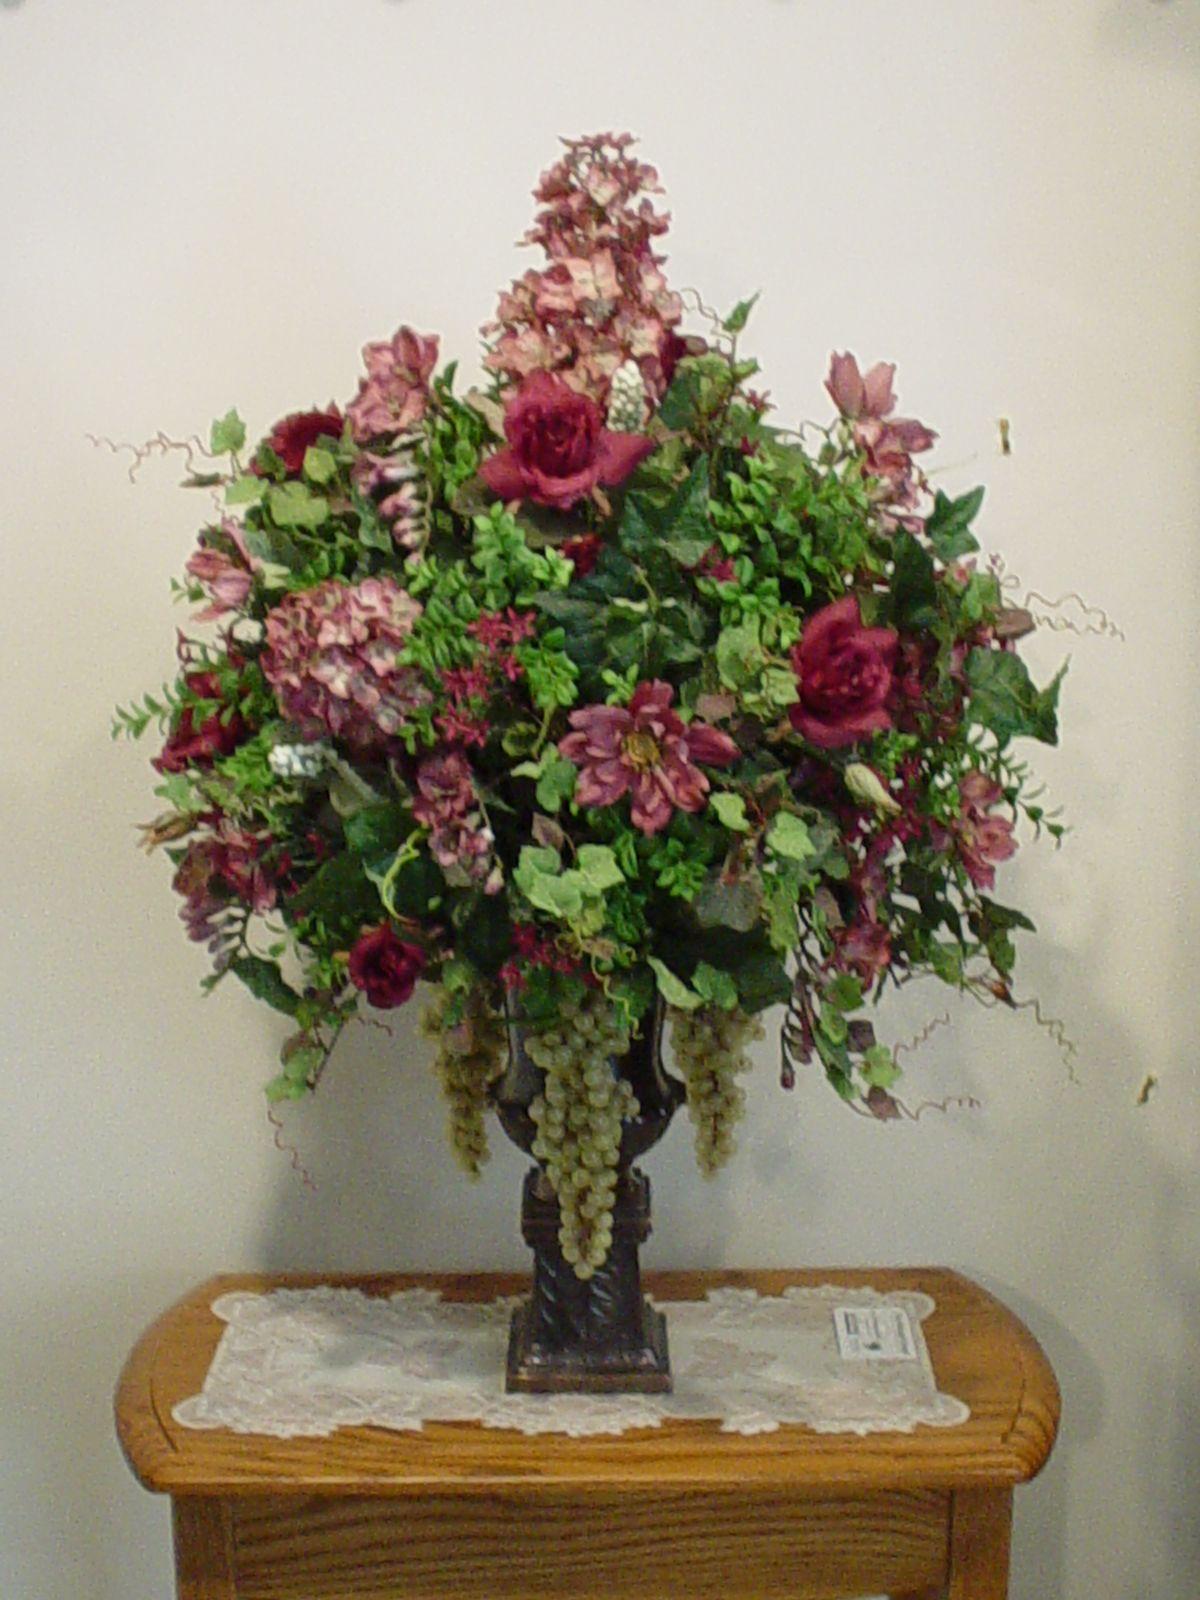 Silk Arrangements For Home Decor Silk Flower Arrangements For Home Silk Floral Arrangements And